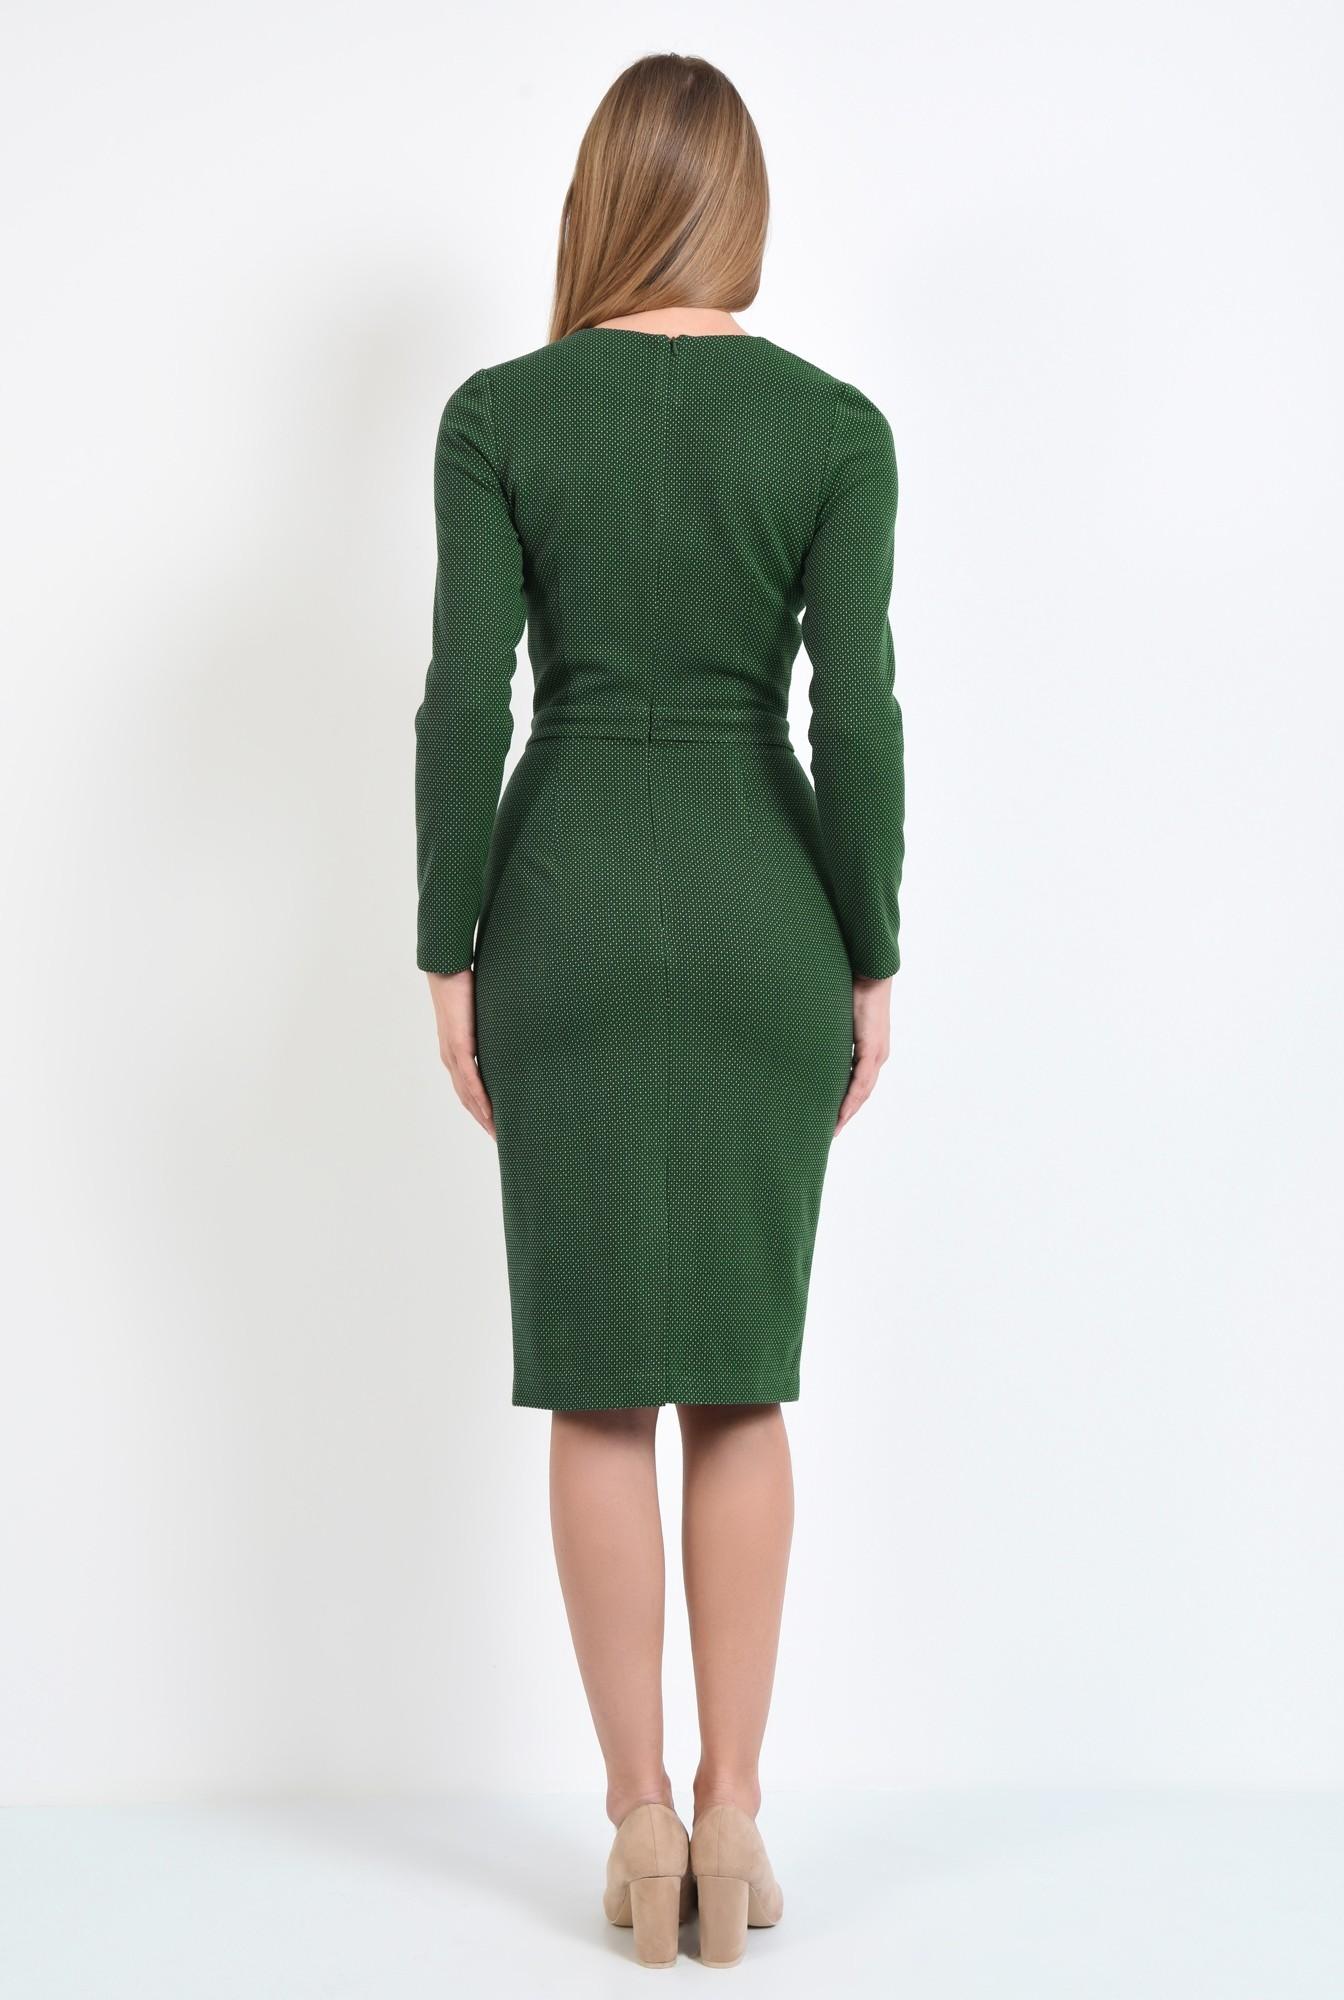 1 - rochie verde, creion, conica, midi, decolteu la baza gatului